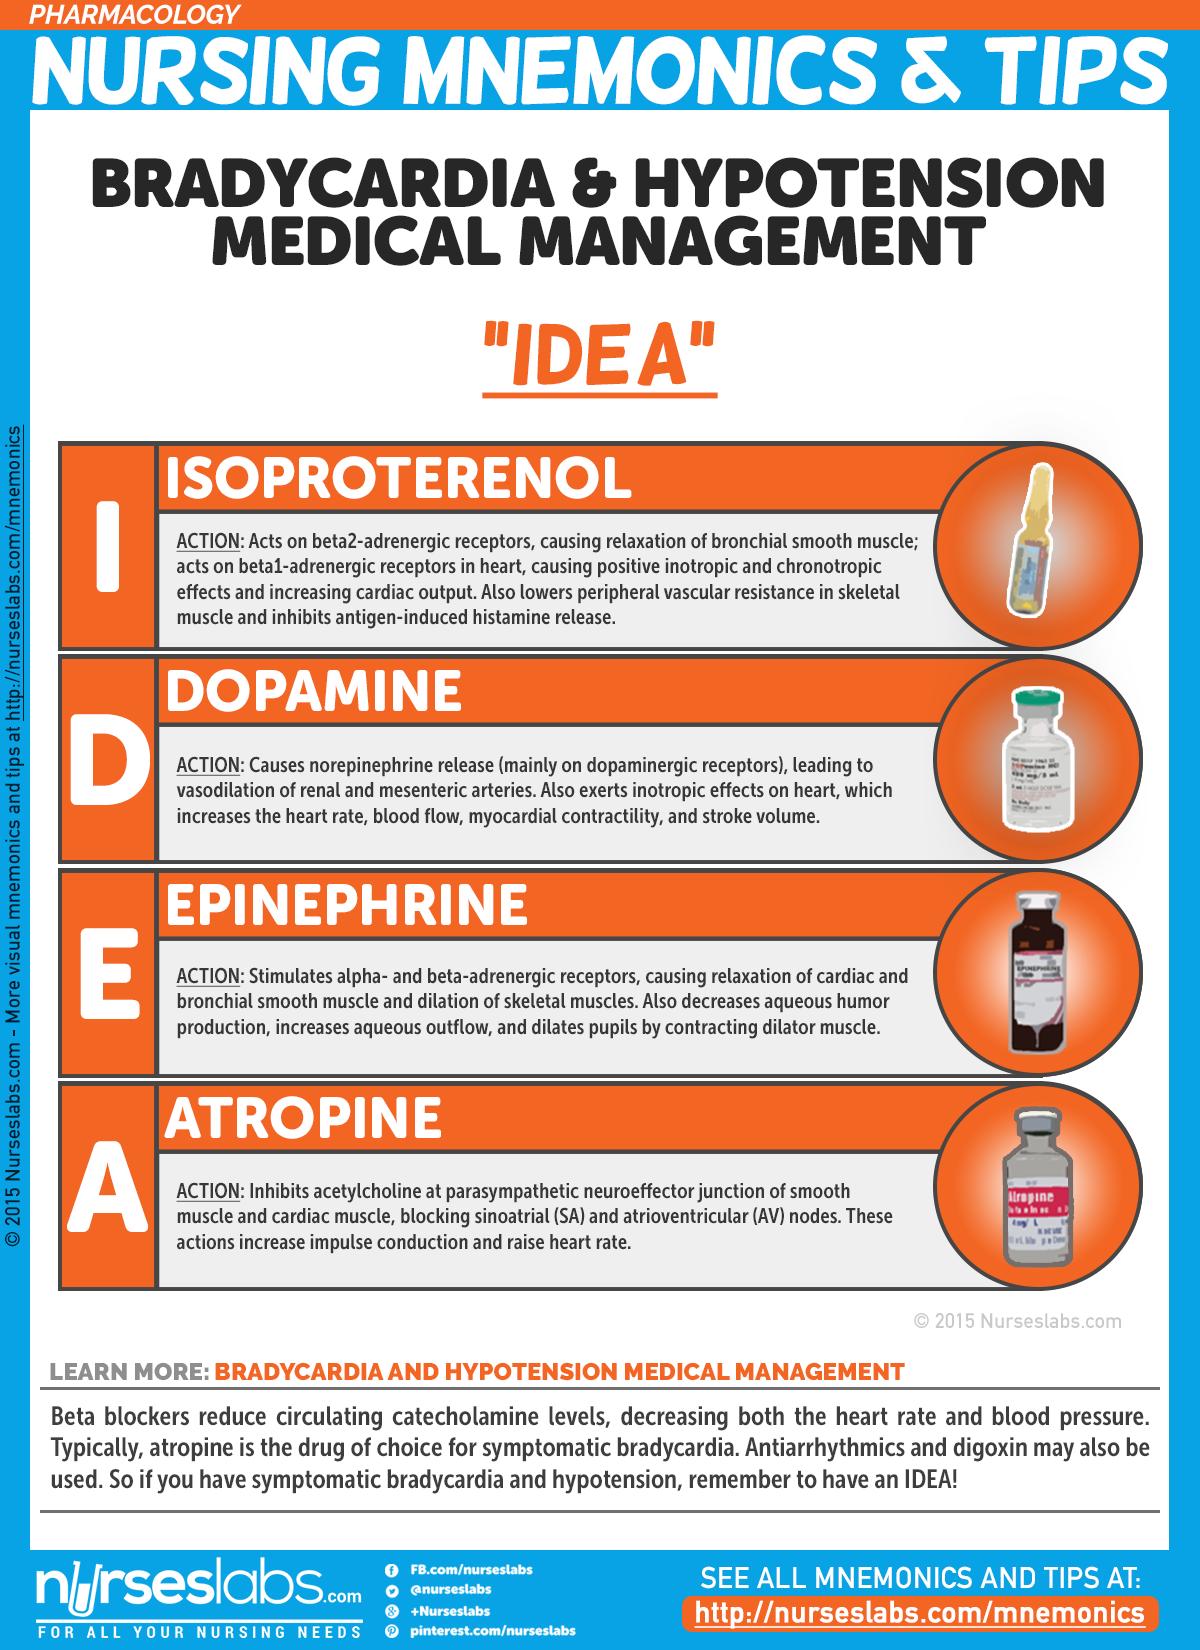 Medical abbreviations taco - Pharmacology Nursing Mnemonics Tips